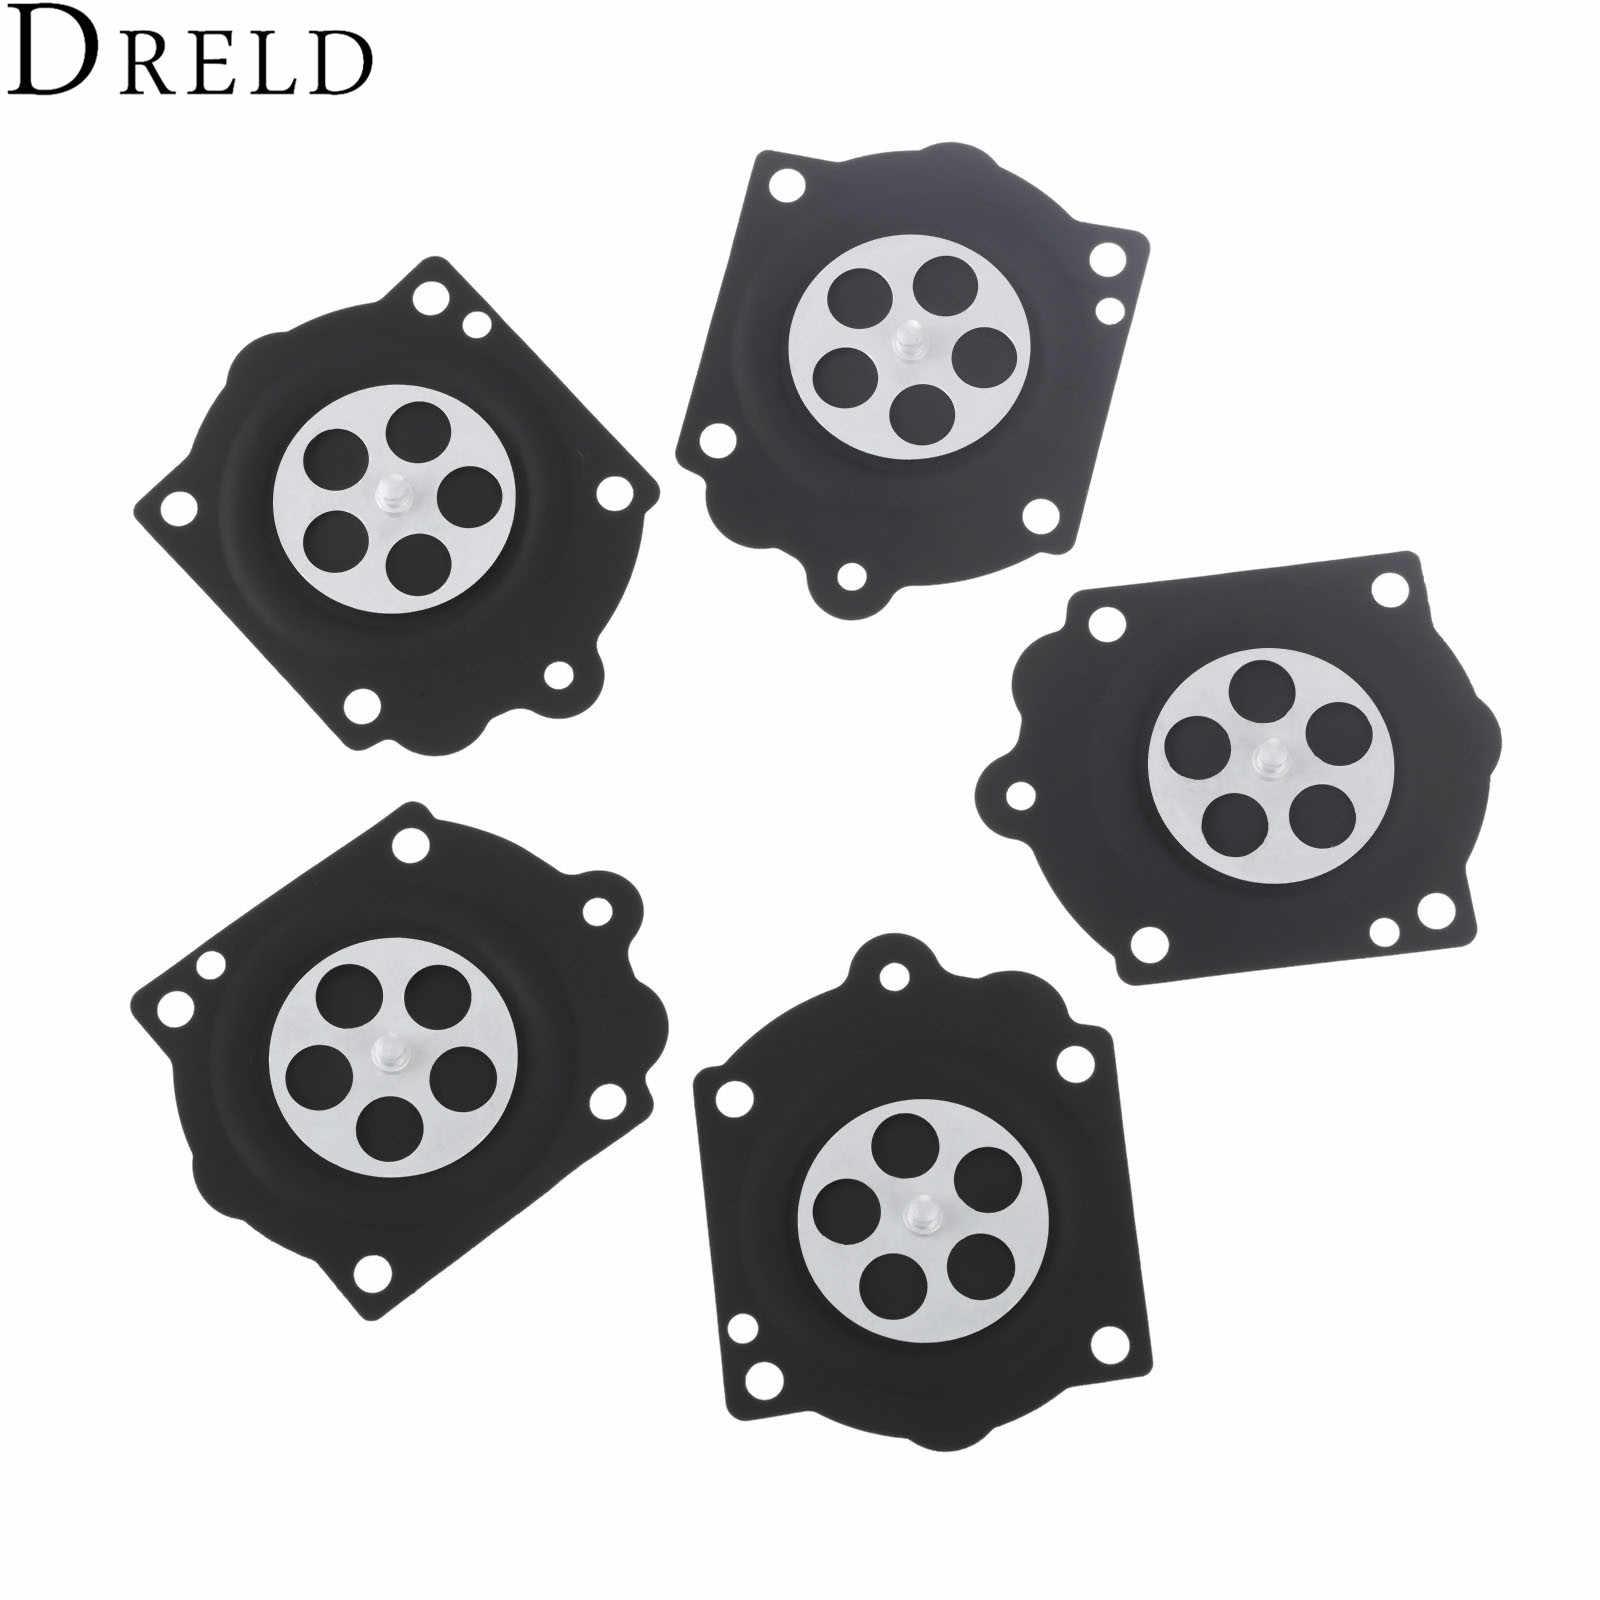 hight resolution of dreld 5pcs carburetor carb rebuild metering diaphragm kit for walbro hdb wg mcculloch pro mac 610